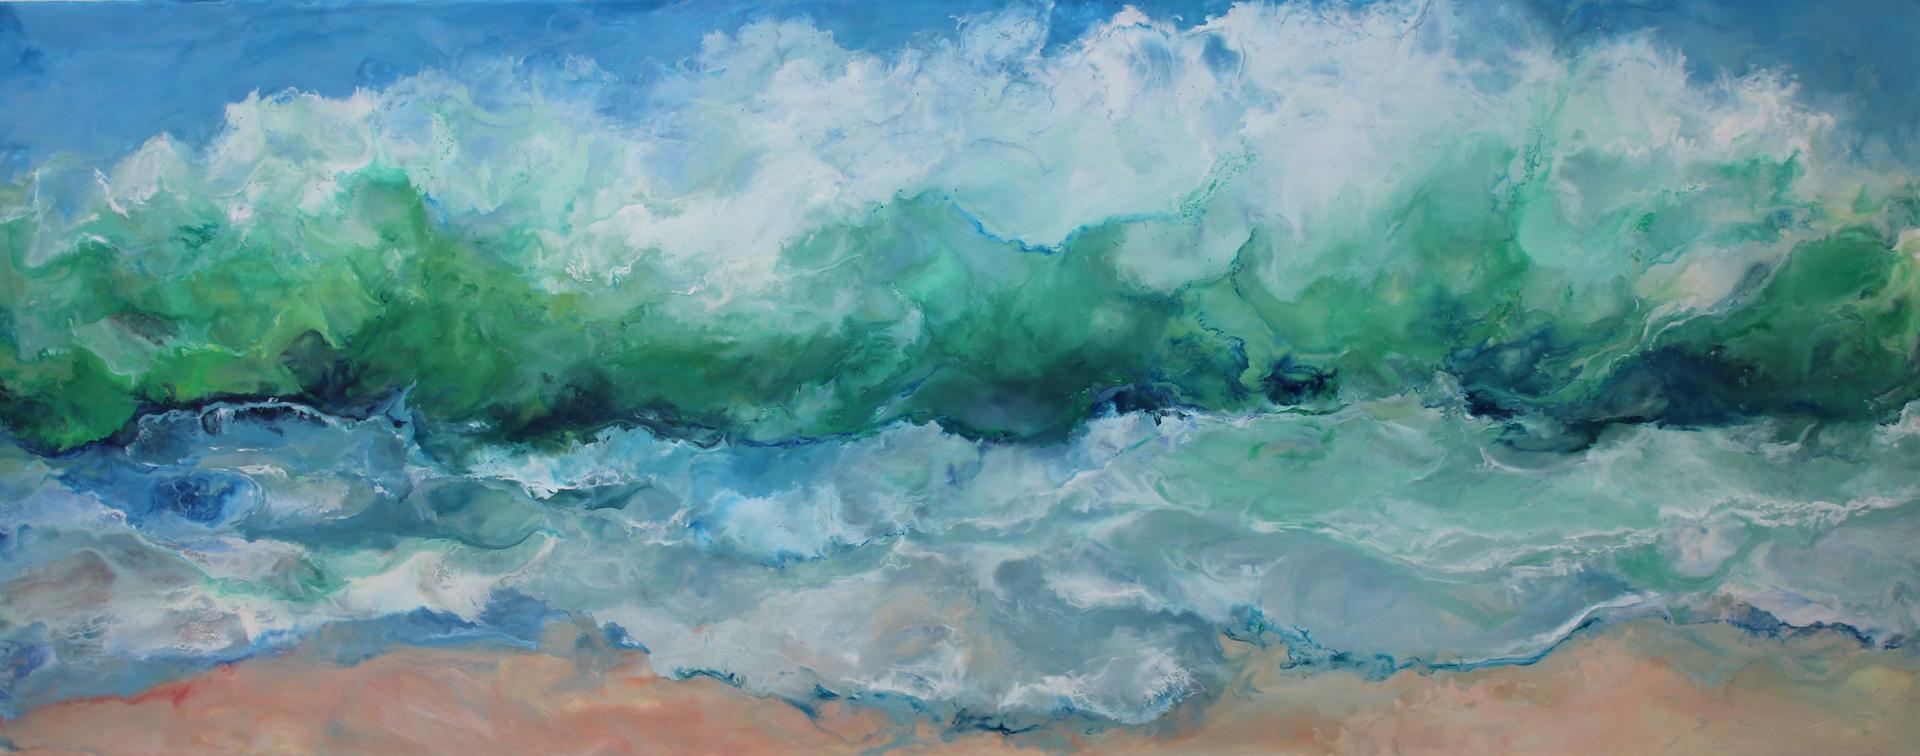 Glance by Ruth Hamill